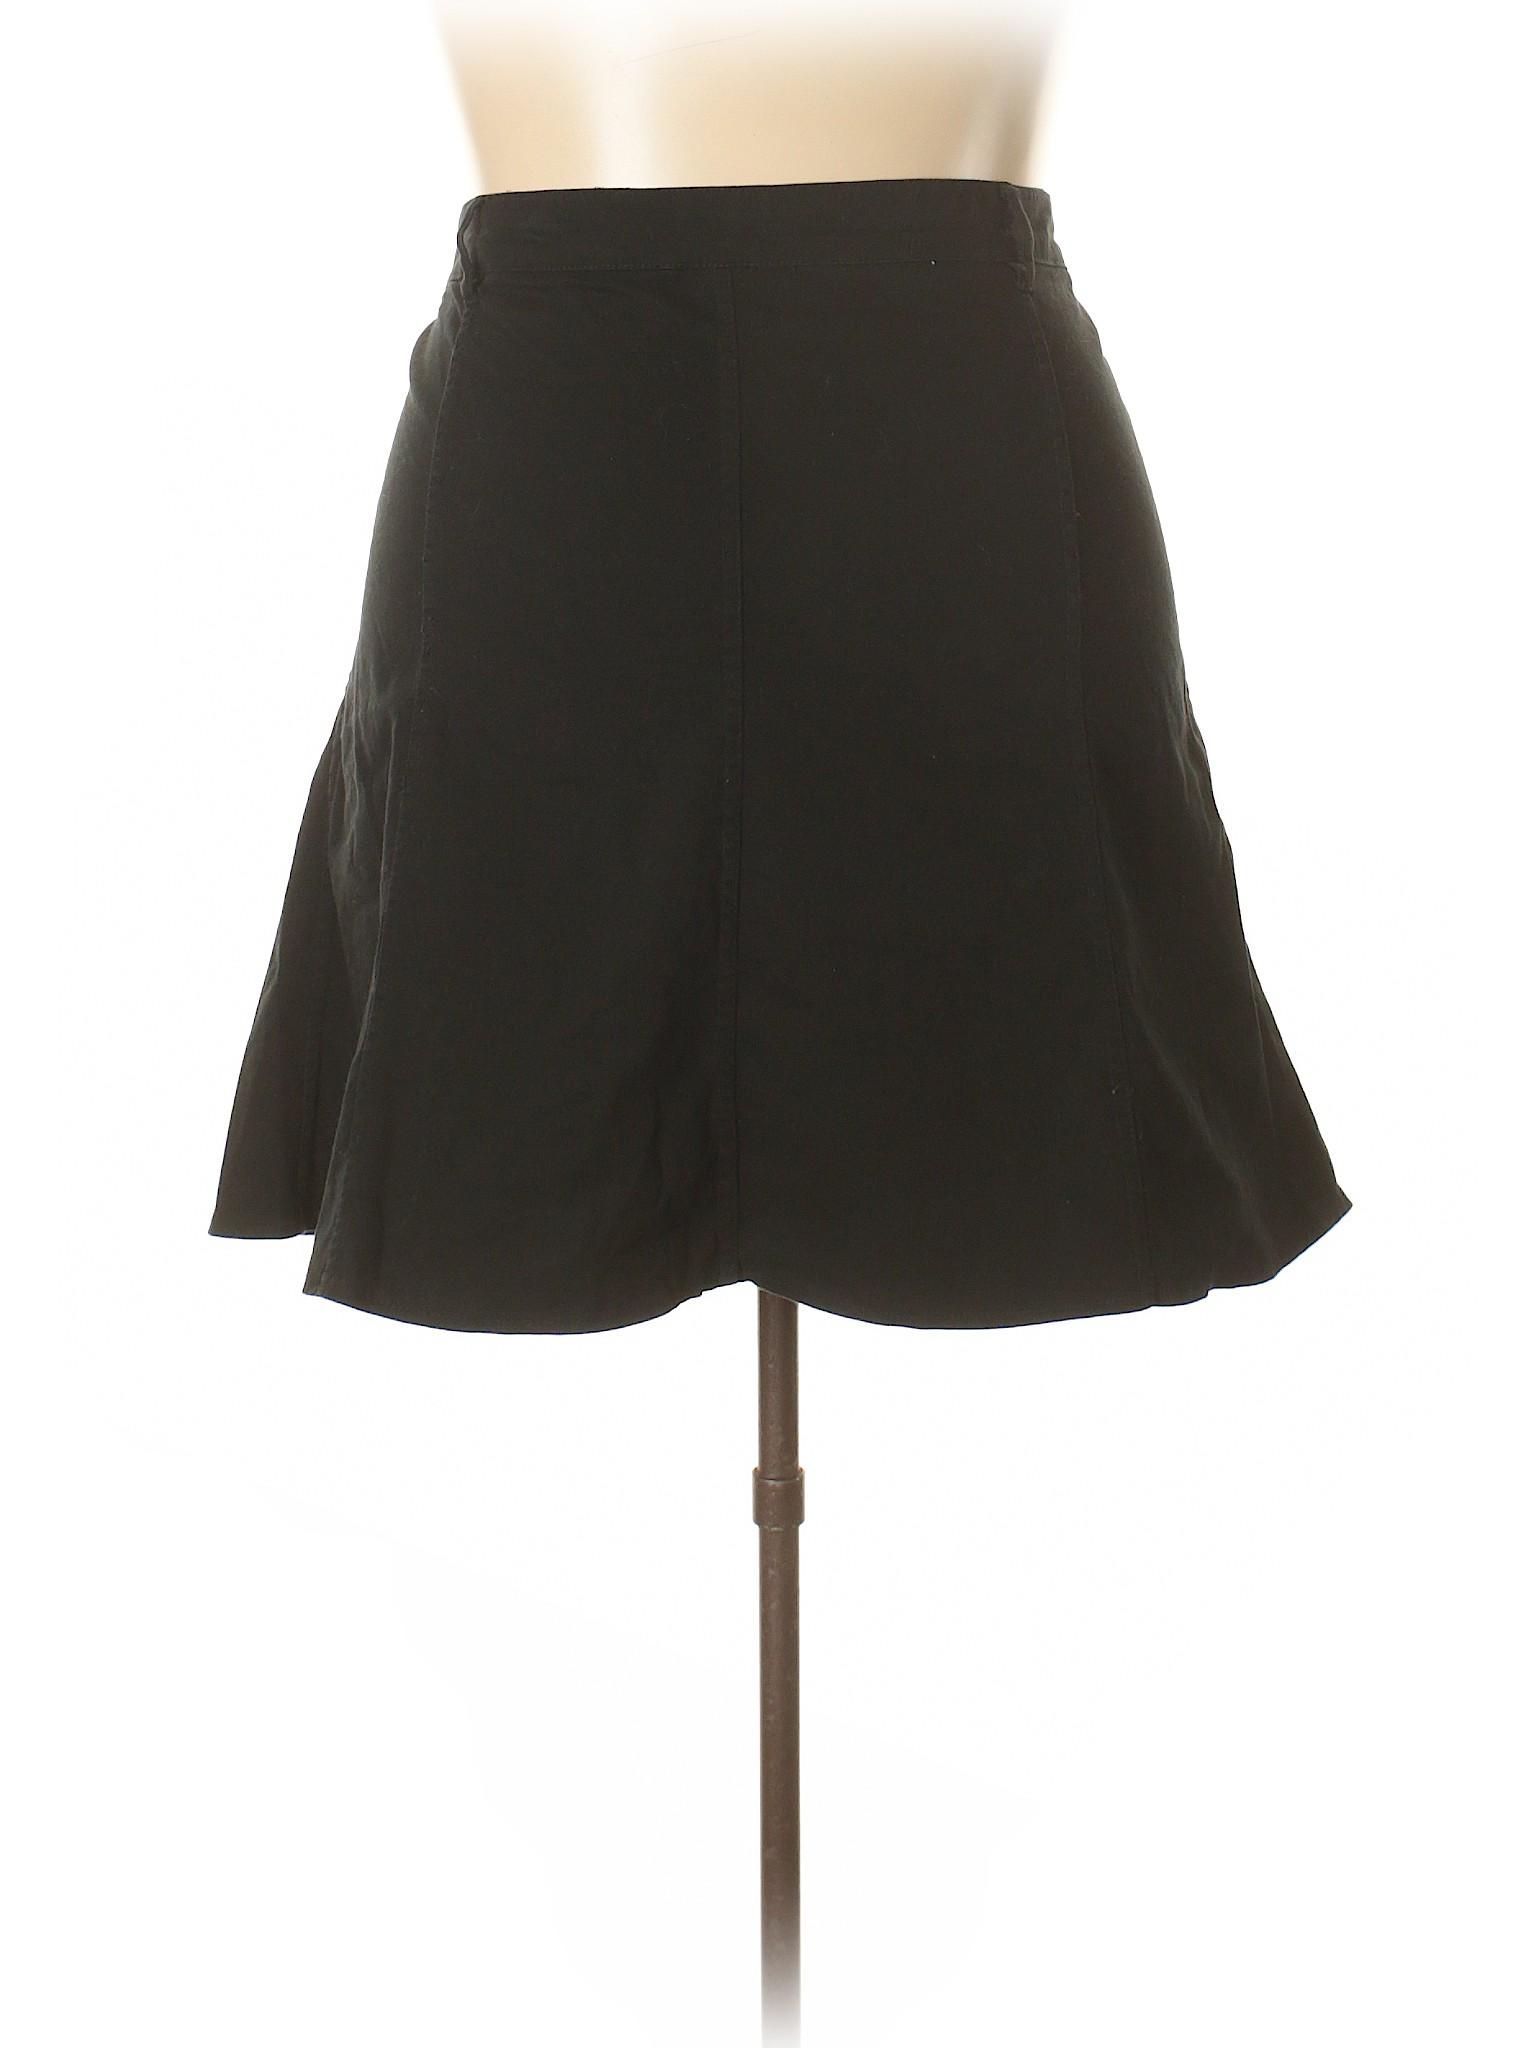 Leisure winter Casual winter Deb Casual Skirt Leisure Deb PqnrP7w1